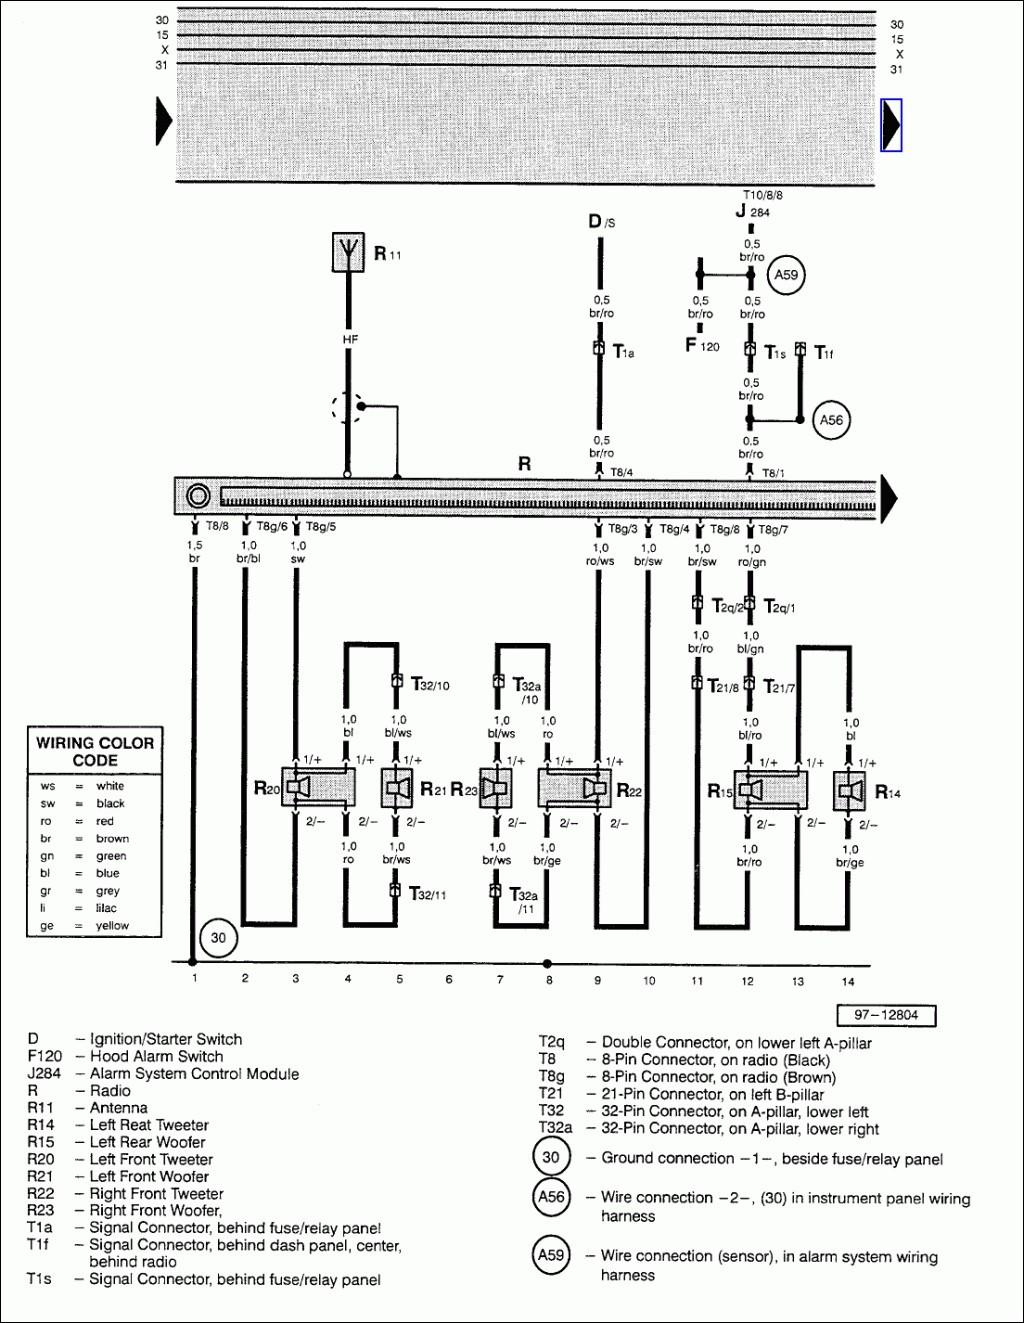 99 Vw Jetta Wiring Diagram - Wiring Diagram Perform choice -  choice.bovaribernesiclub.it | 99 Jetta Wiring Diagram |  | choice.bovaribernesiclub.it